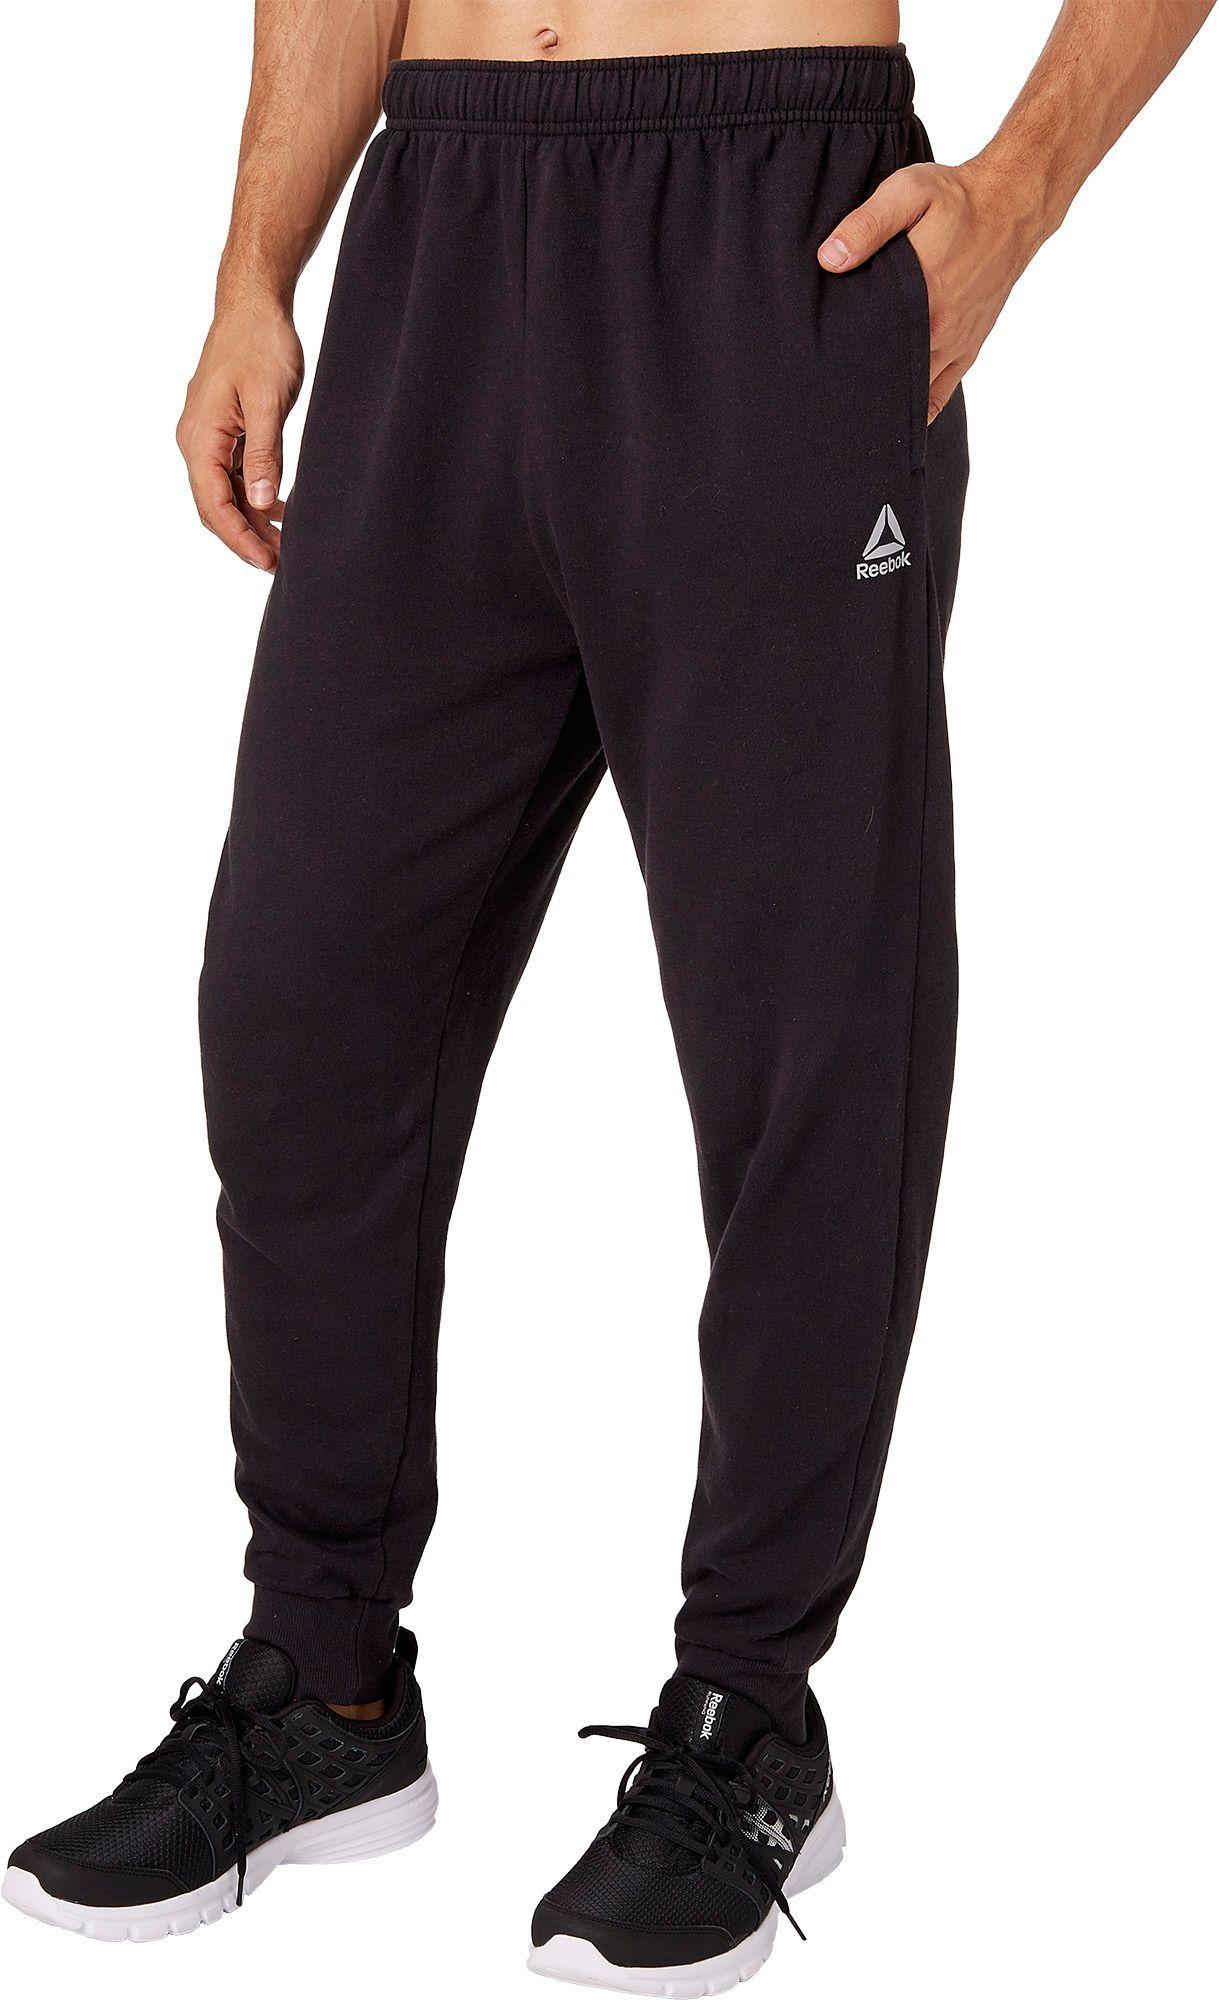 e53f054feb Reebok Men's Cotton Fleece Jogger Pants, Size: XL, Black | Products ...